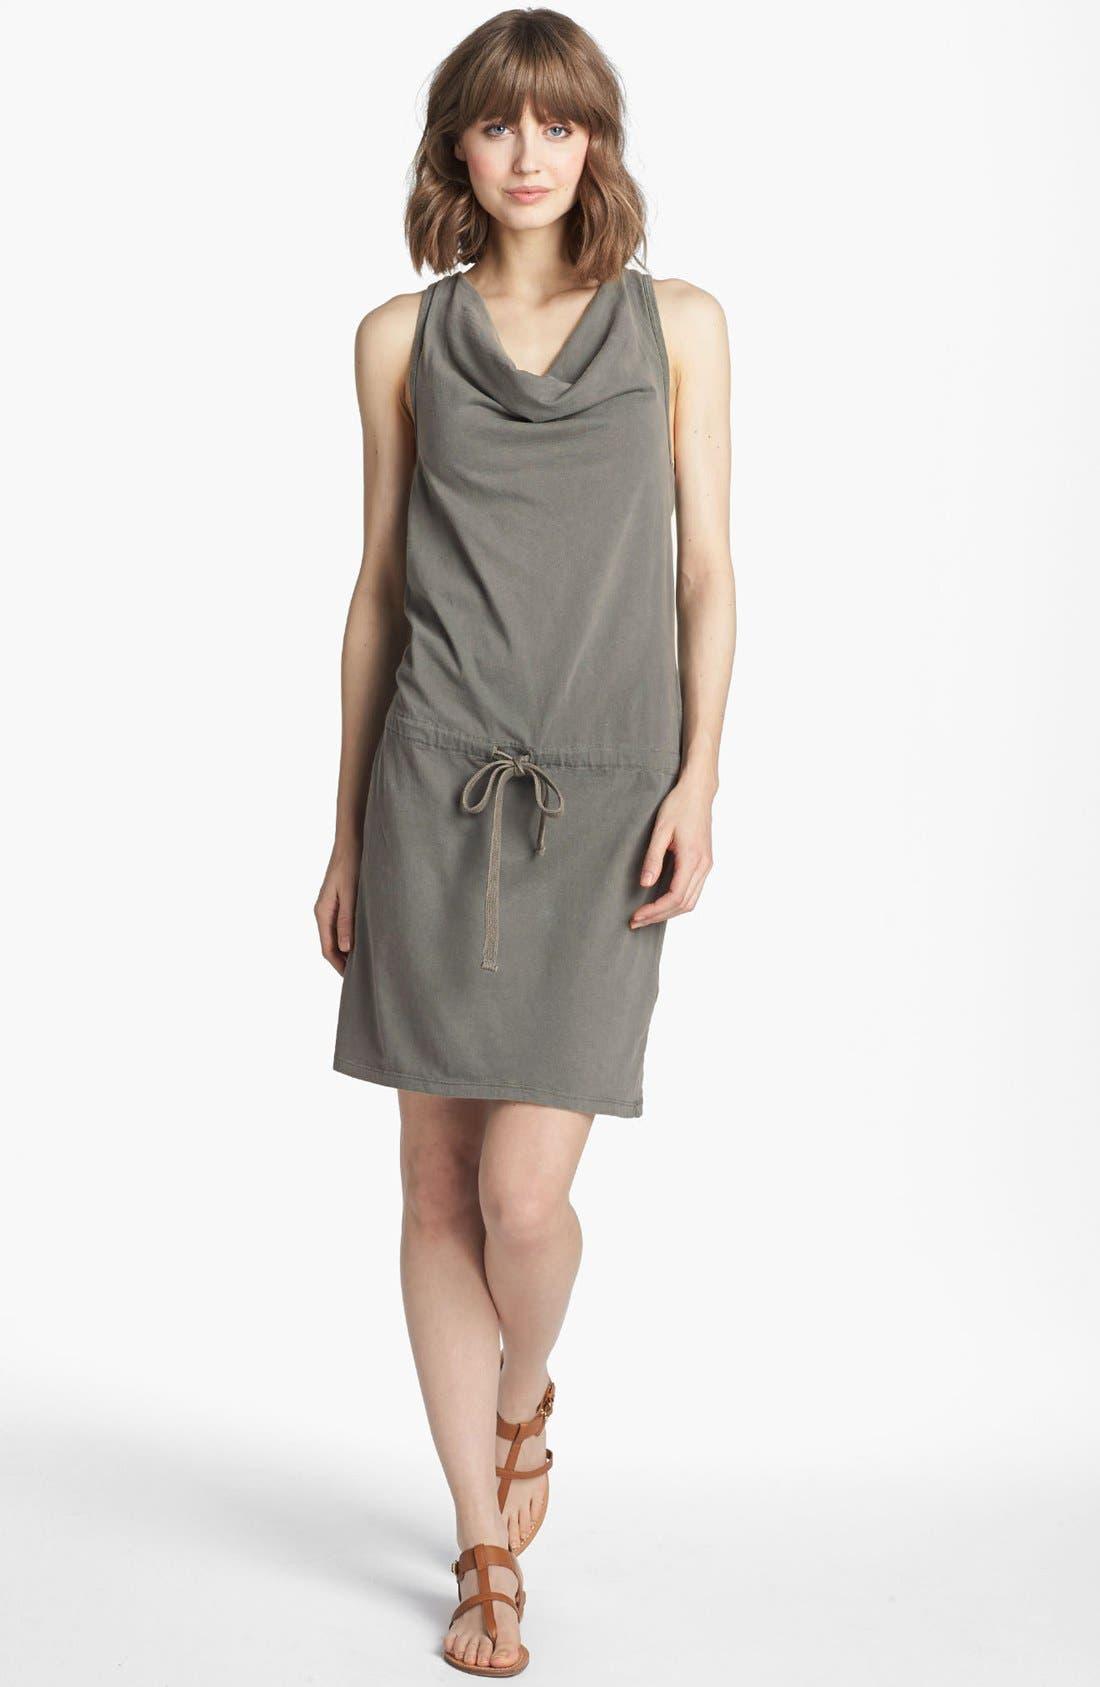 Alternate Image 1 Selected - James Perse Racerback Jersey Dress